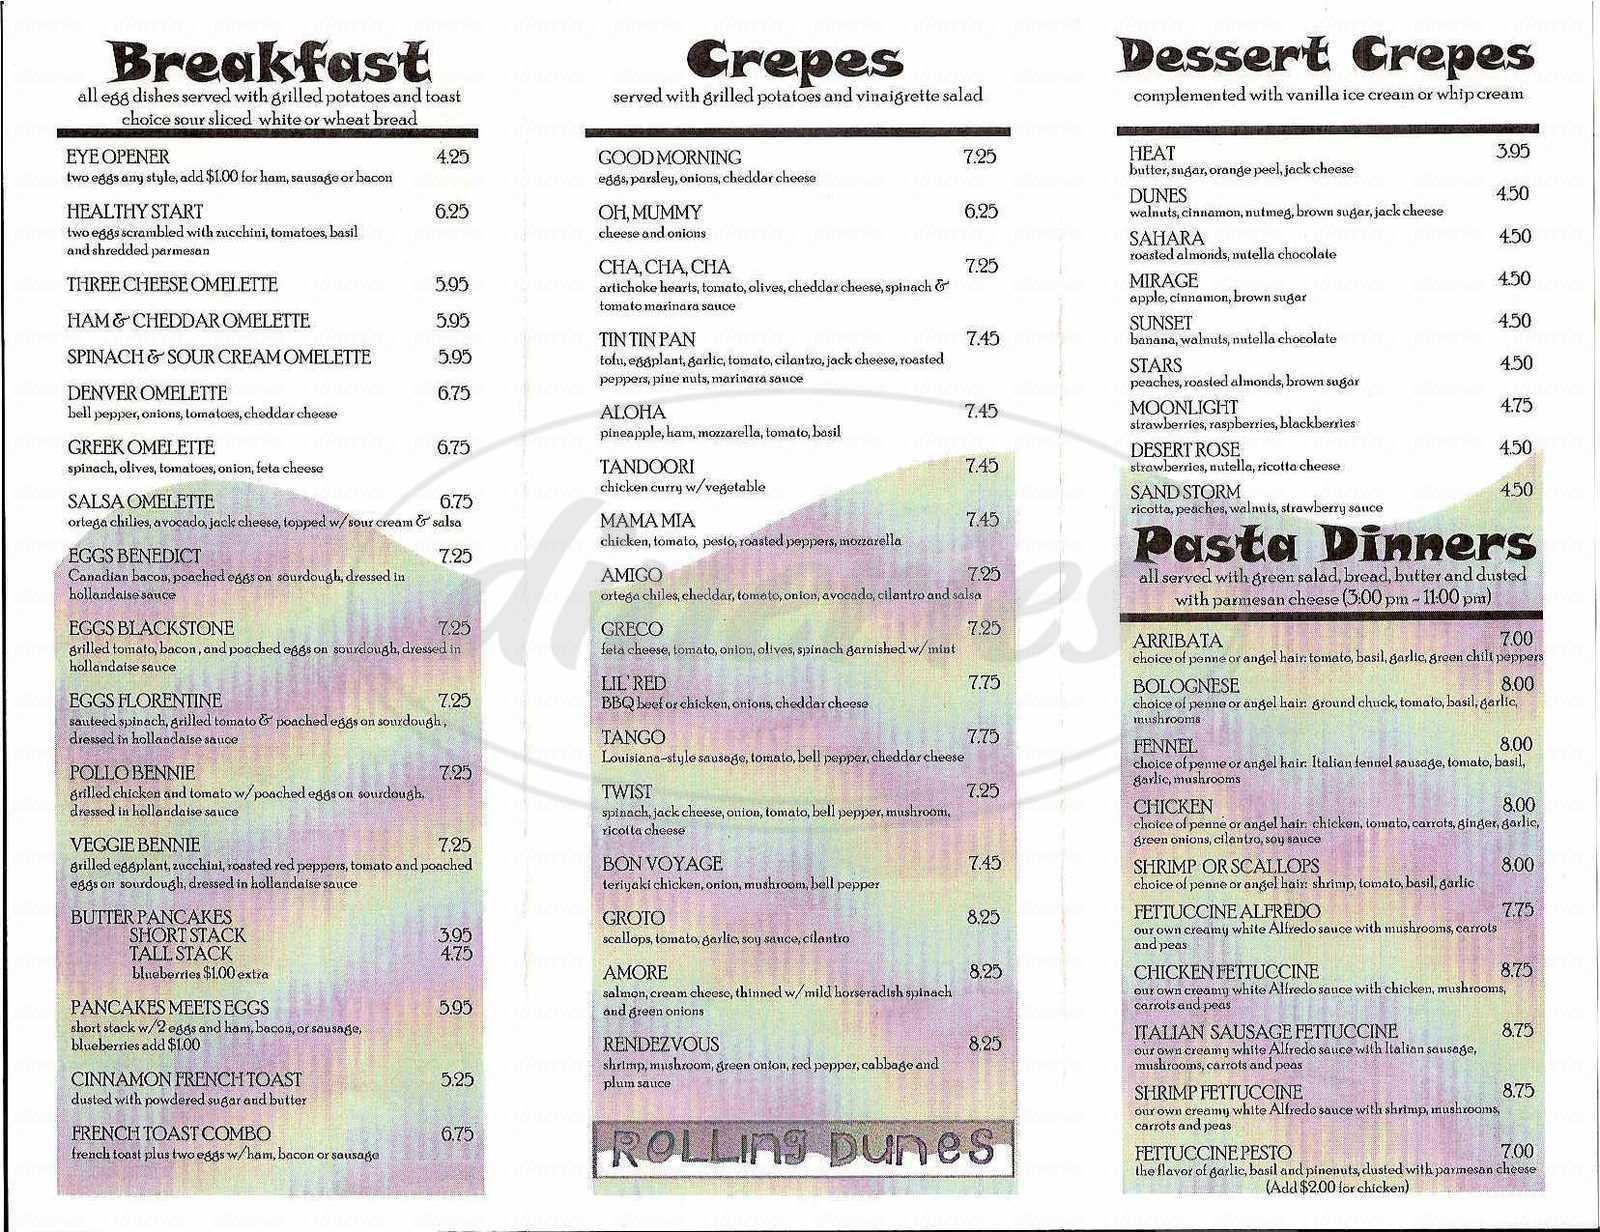 menu for Rolling Dunes